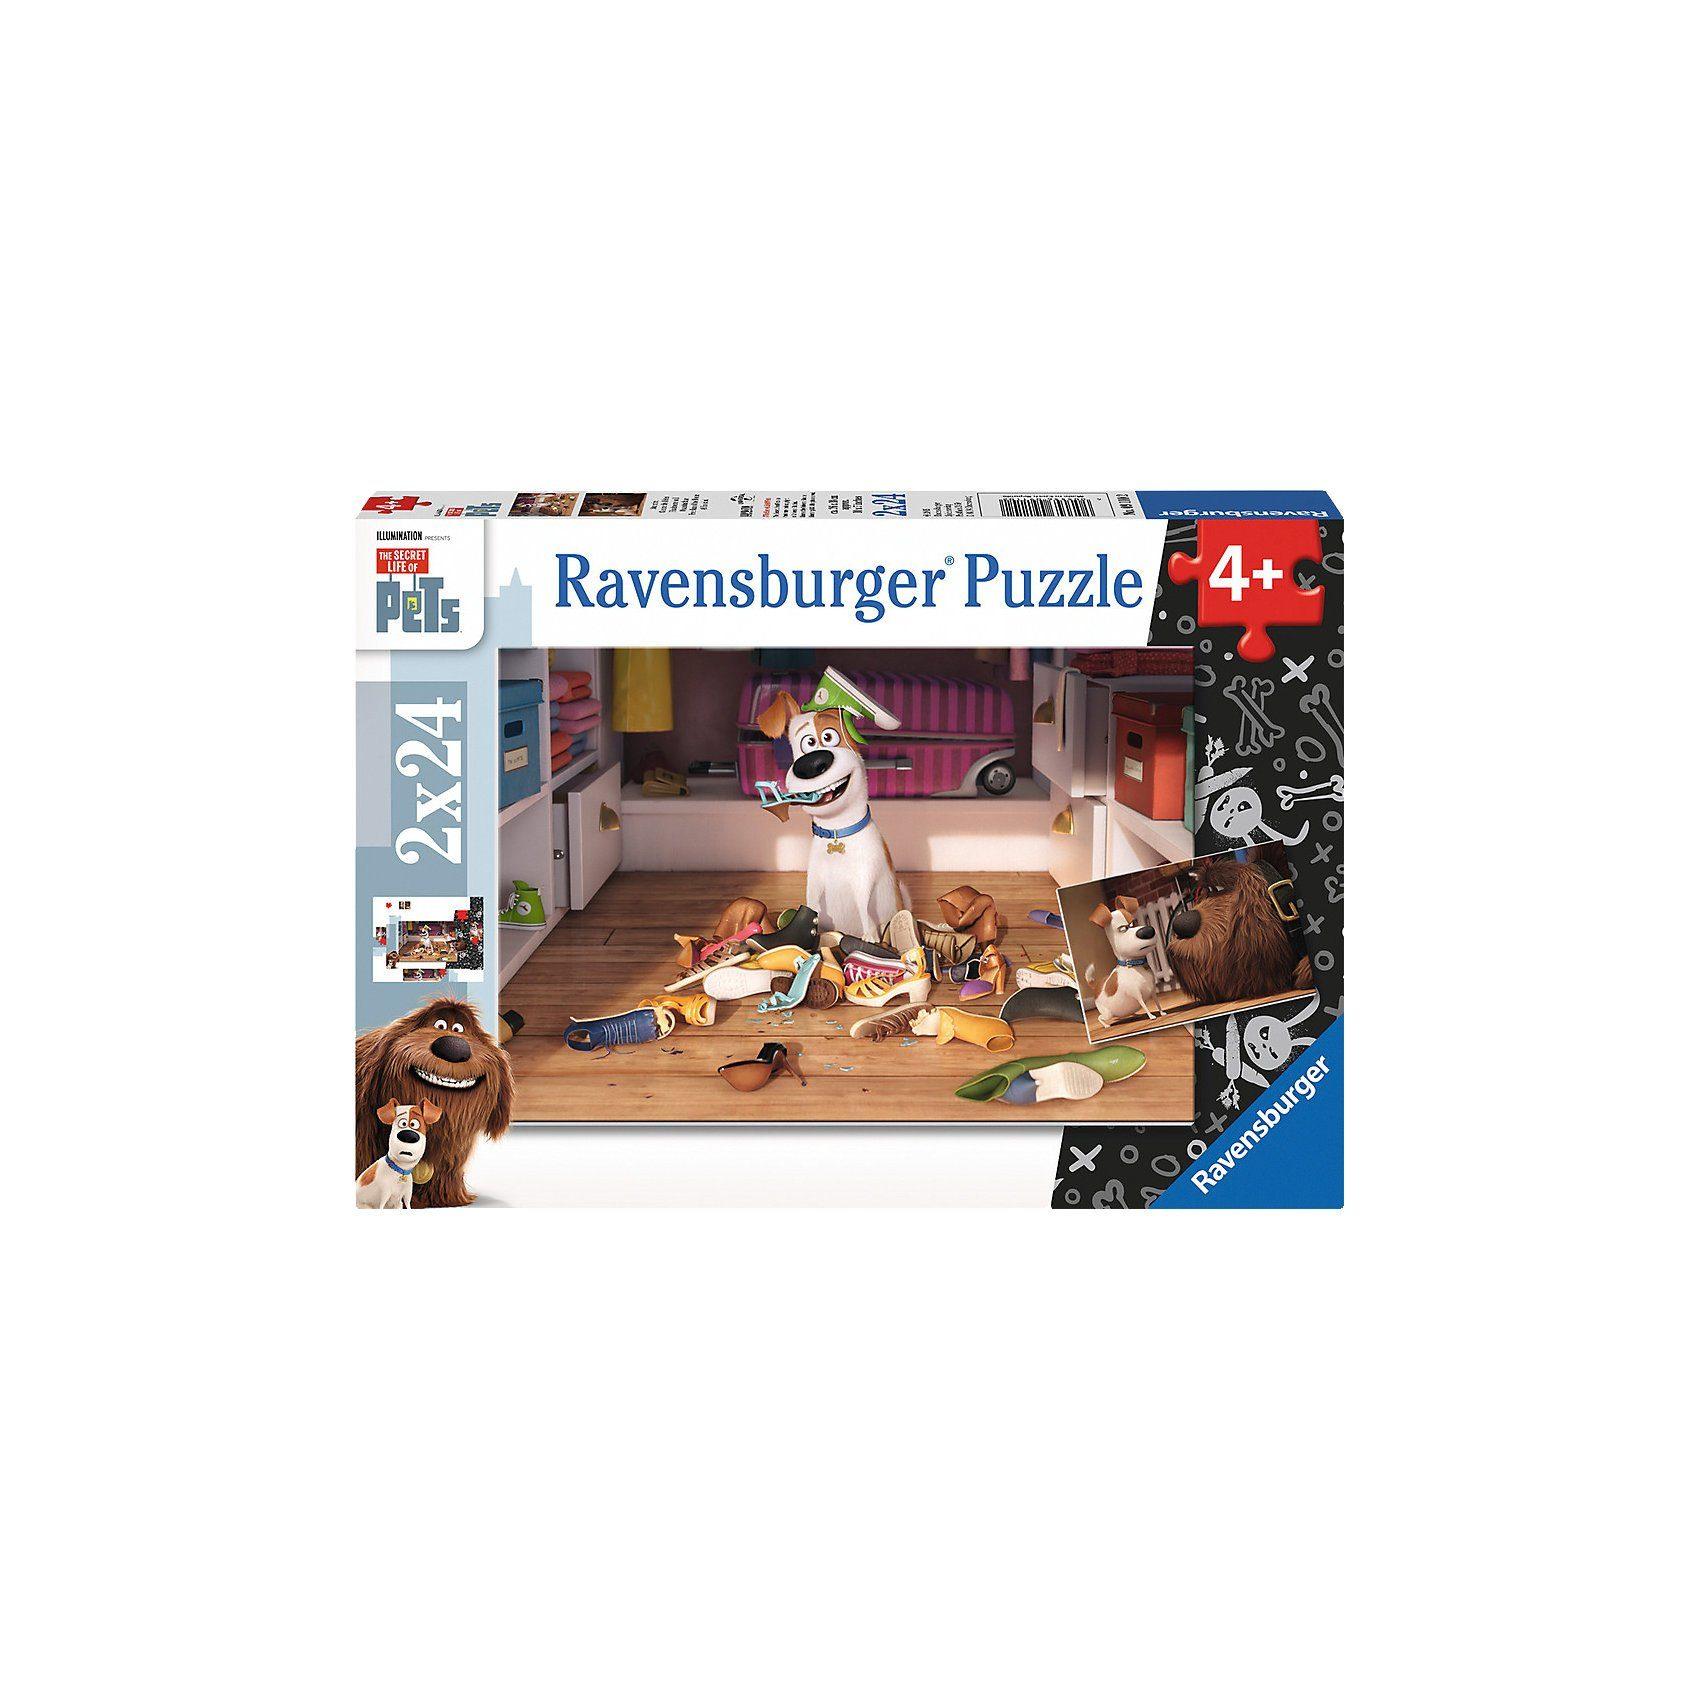 Ravensburger Puzzleset 2 x 24 Teile Pets - Sturmfrei